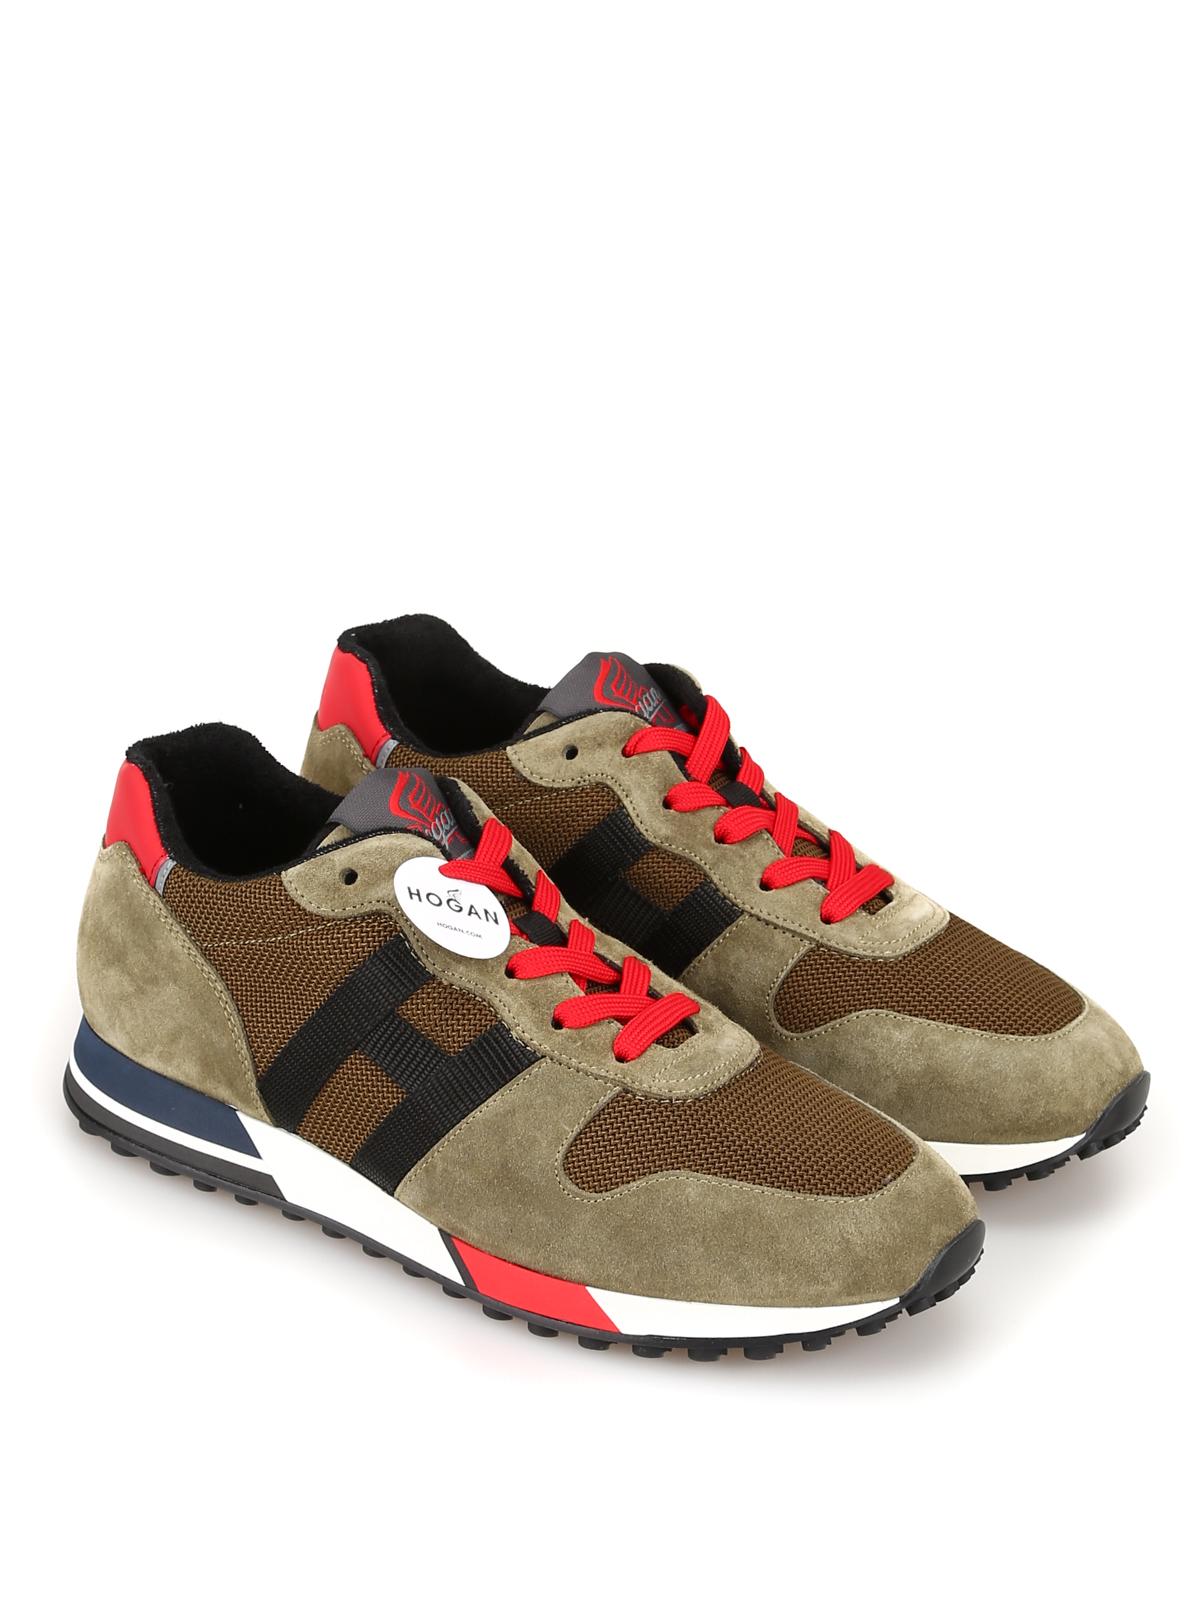 Trainers Hogan - H383 Retro Running sneakers - HXM3830AN51MBV796W